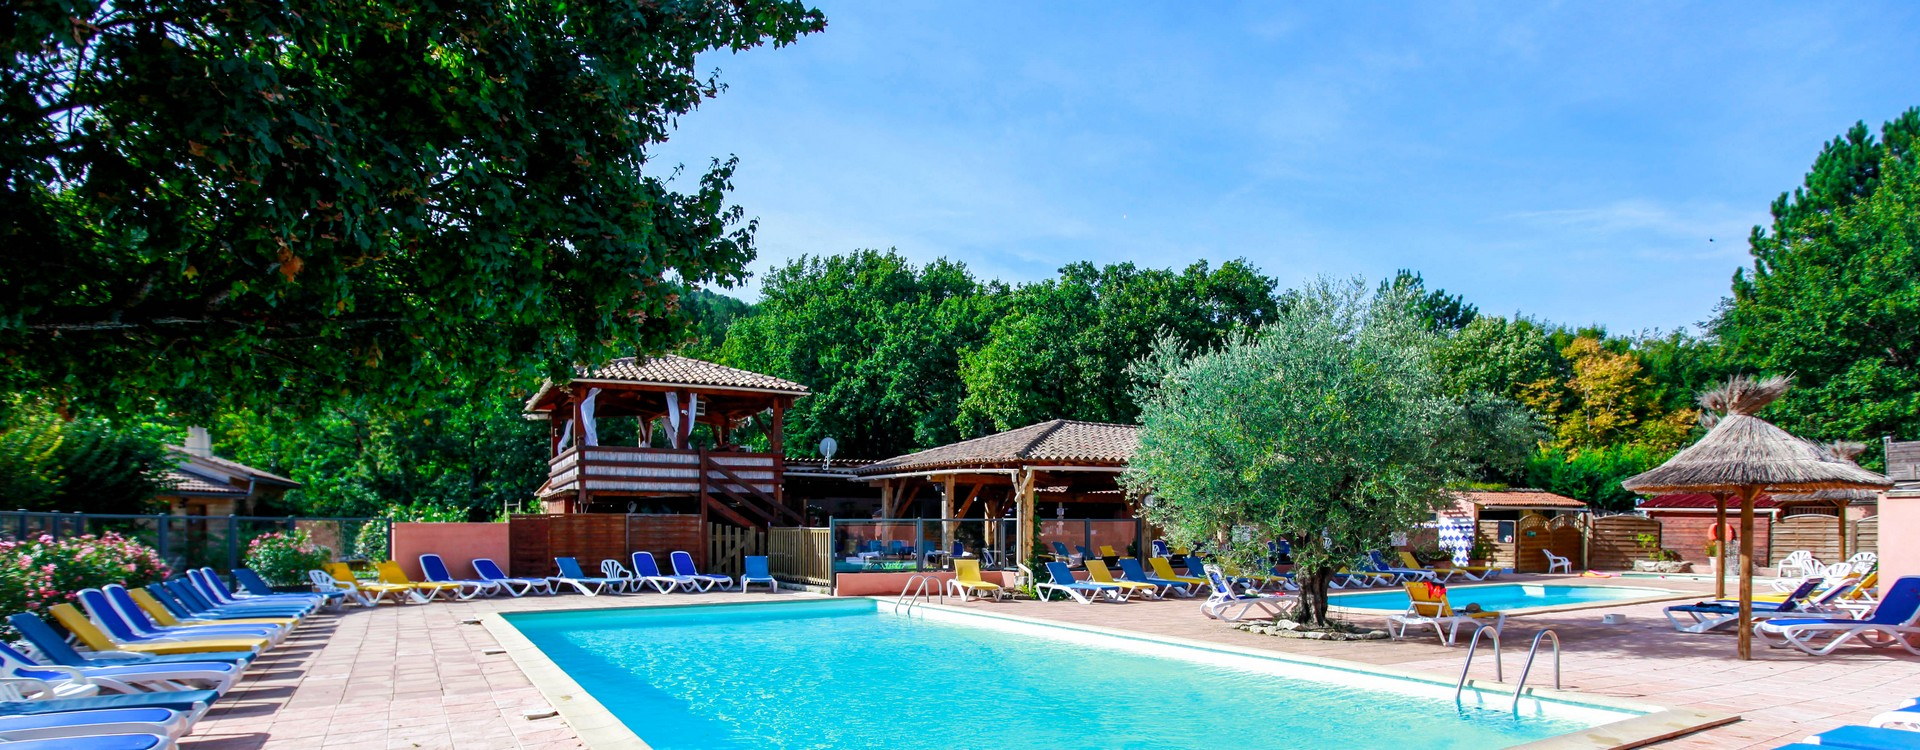 Camping Le Luberon : Slider